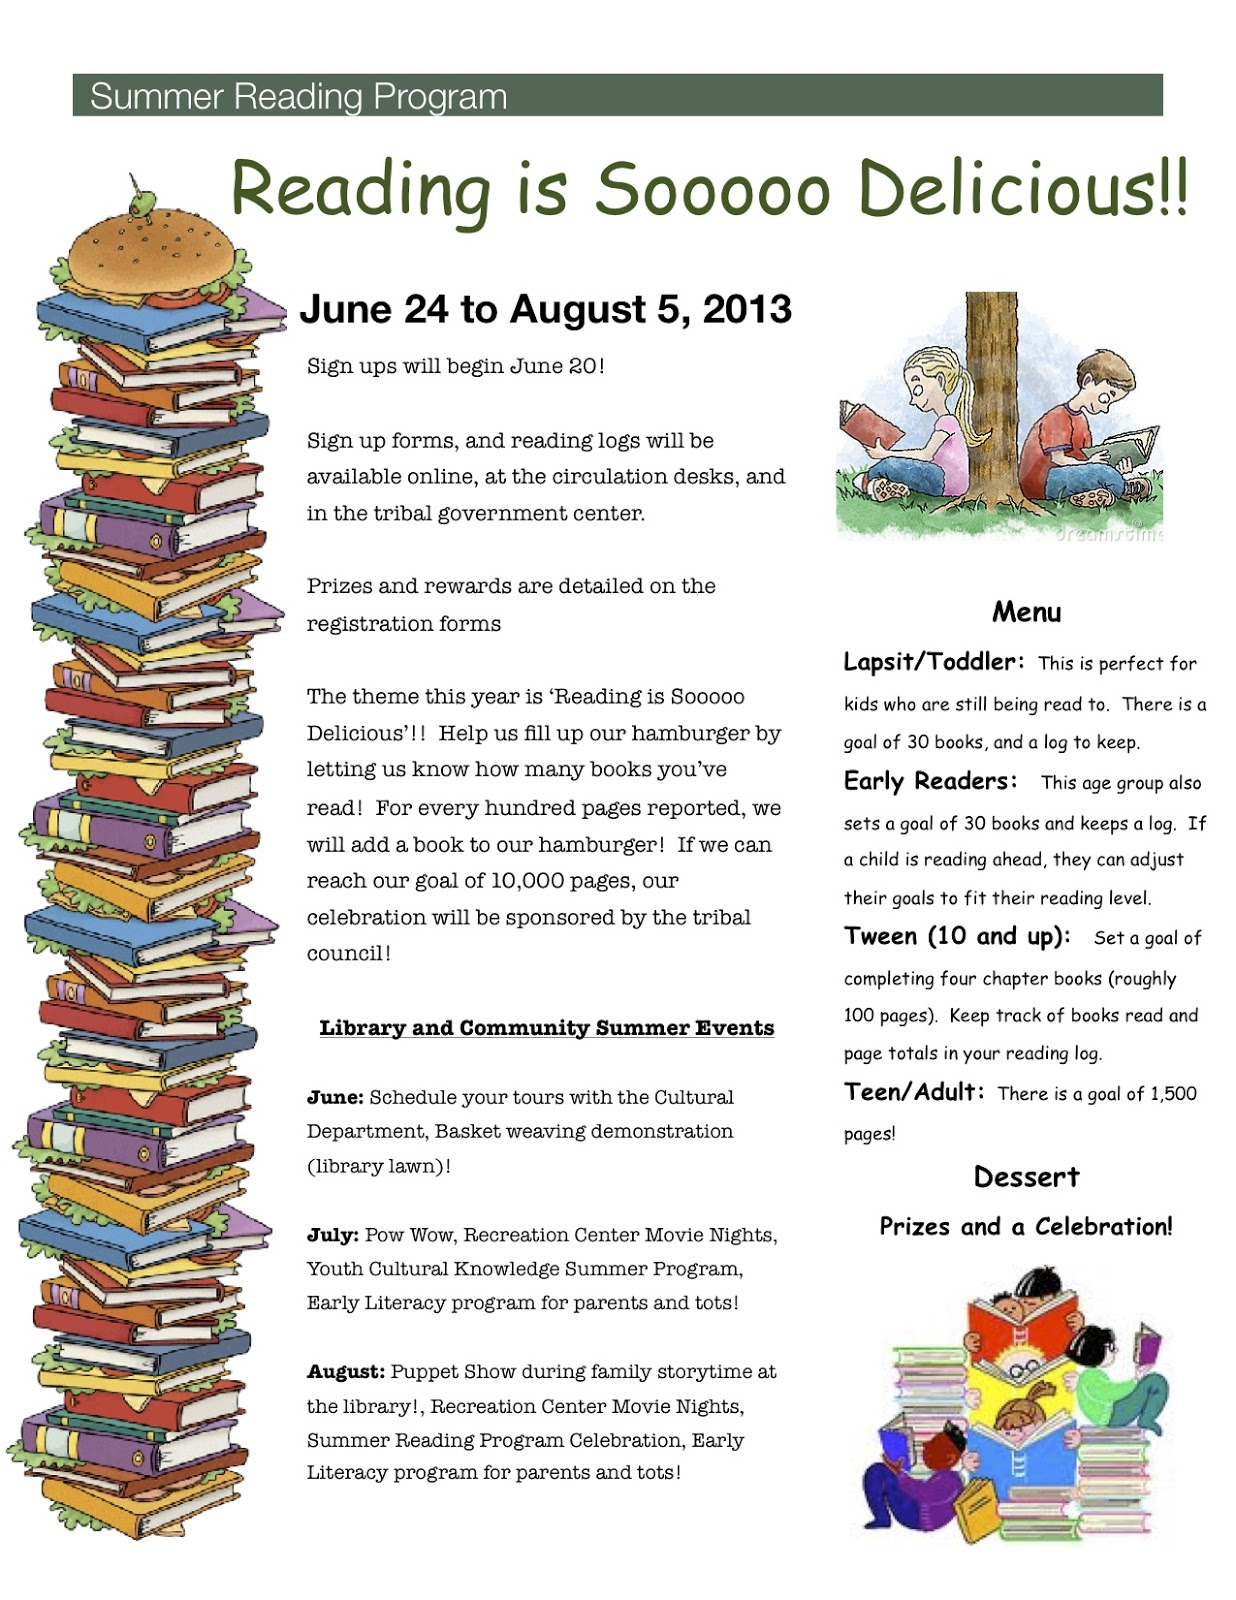 Kinder Garden: Super Kids Reading Program Blog Spot